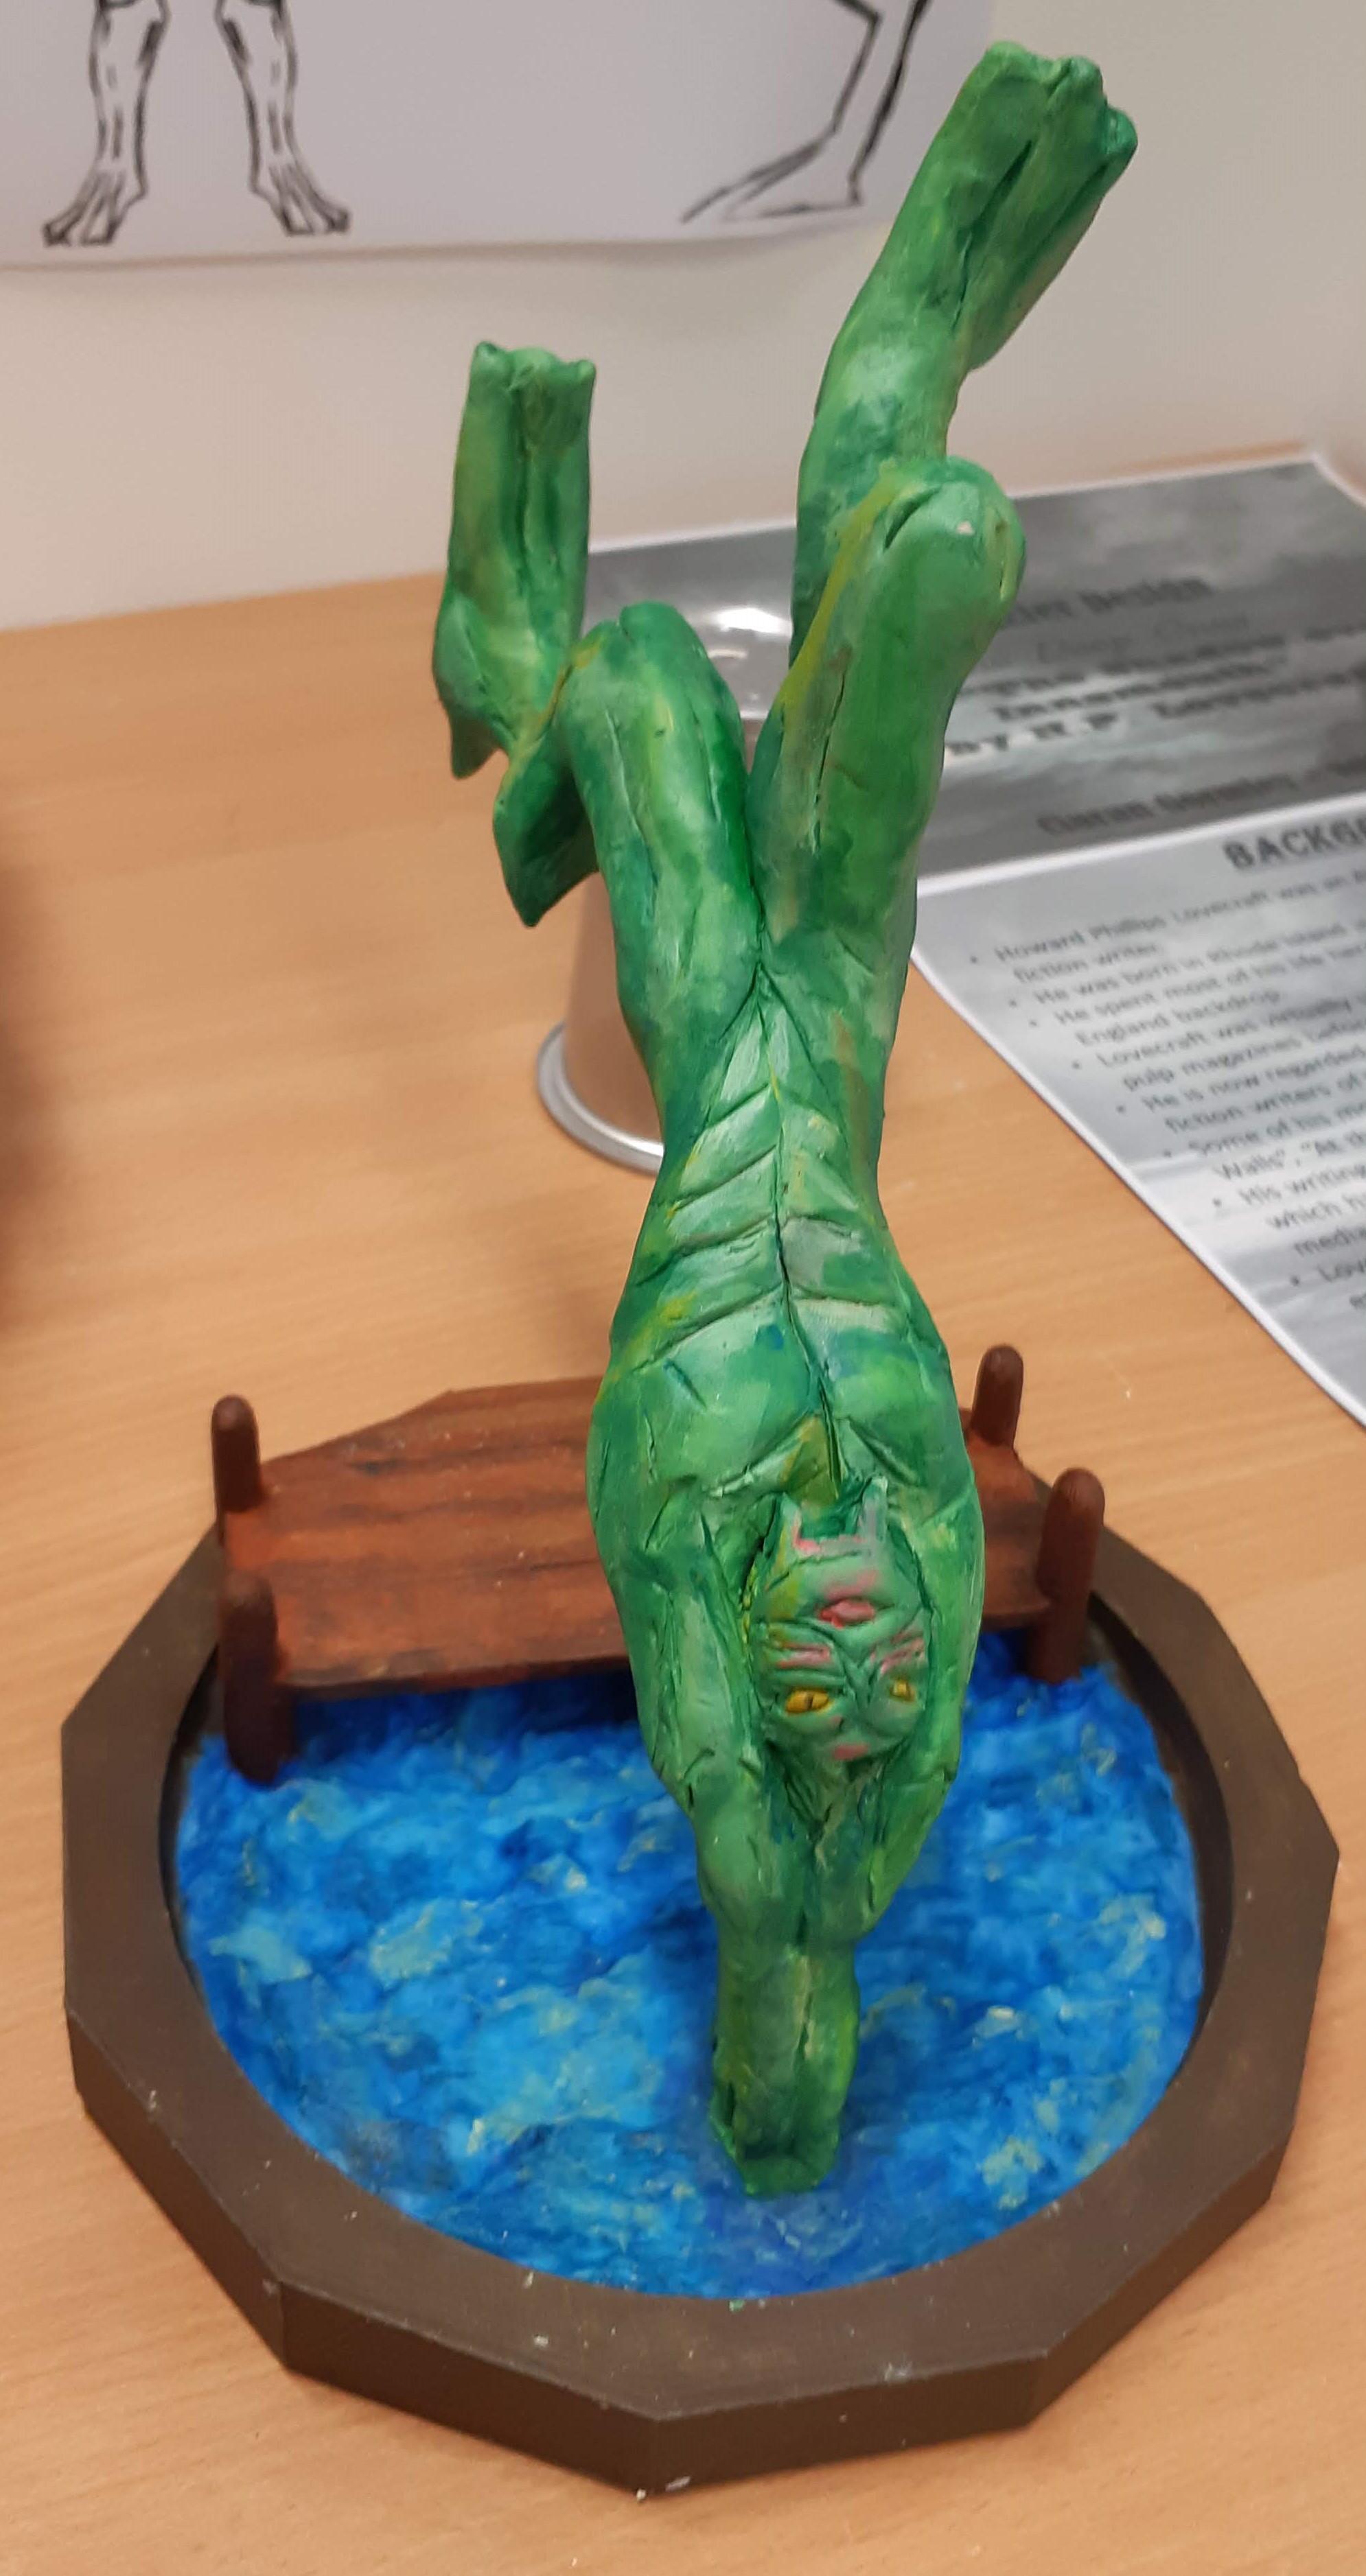 Sculpie Maquette Model on 3D Printed Base